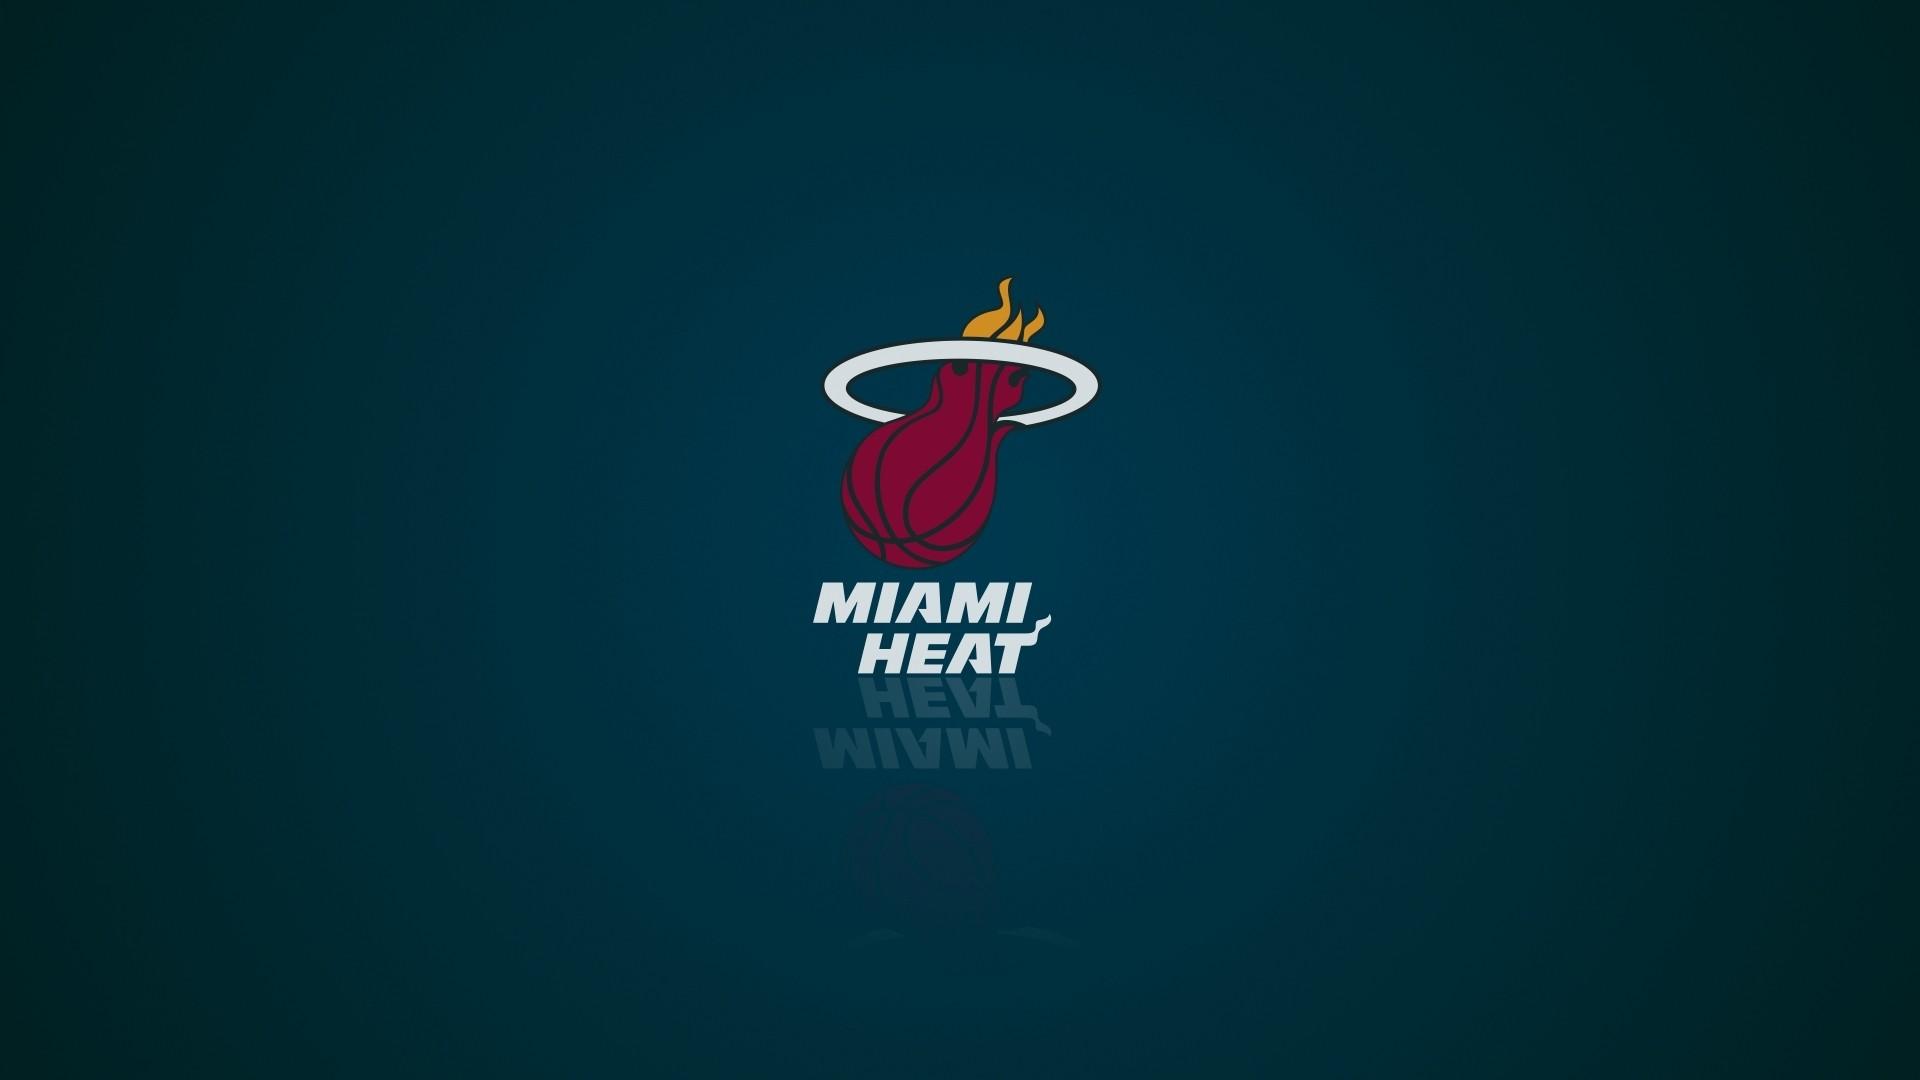 Miami Heat wallpaper photo hd